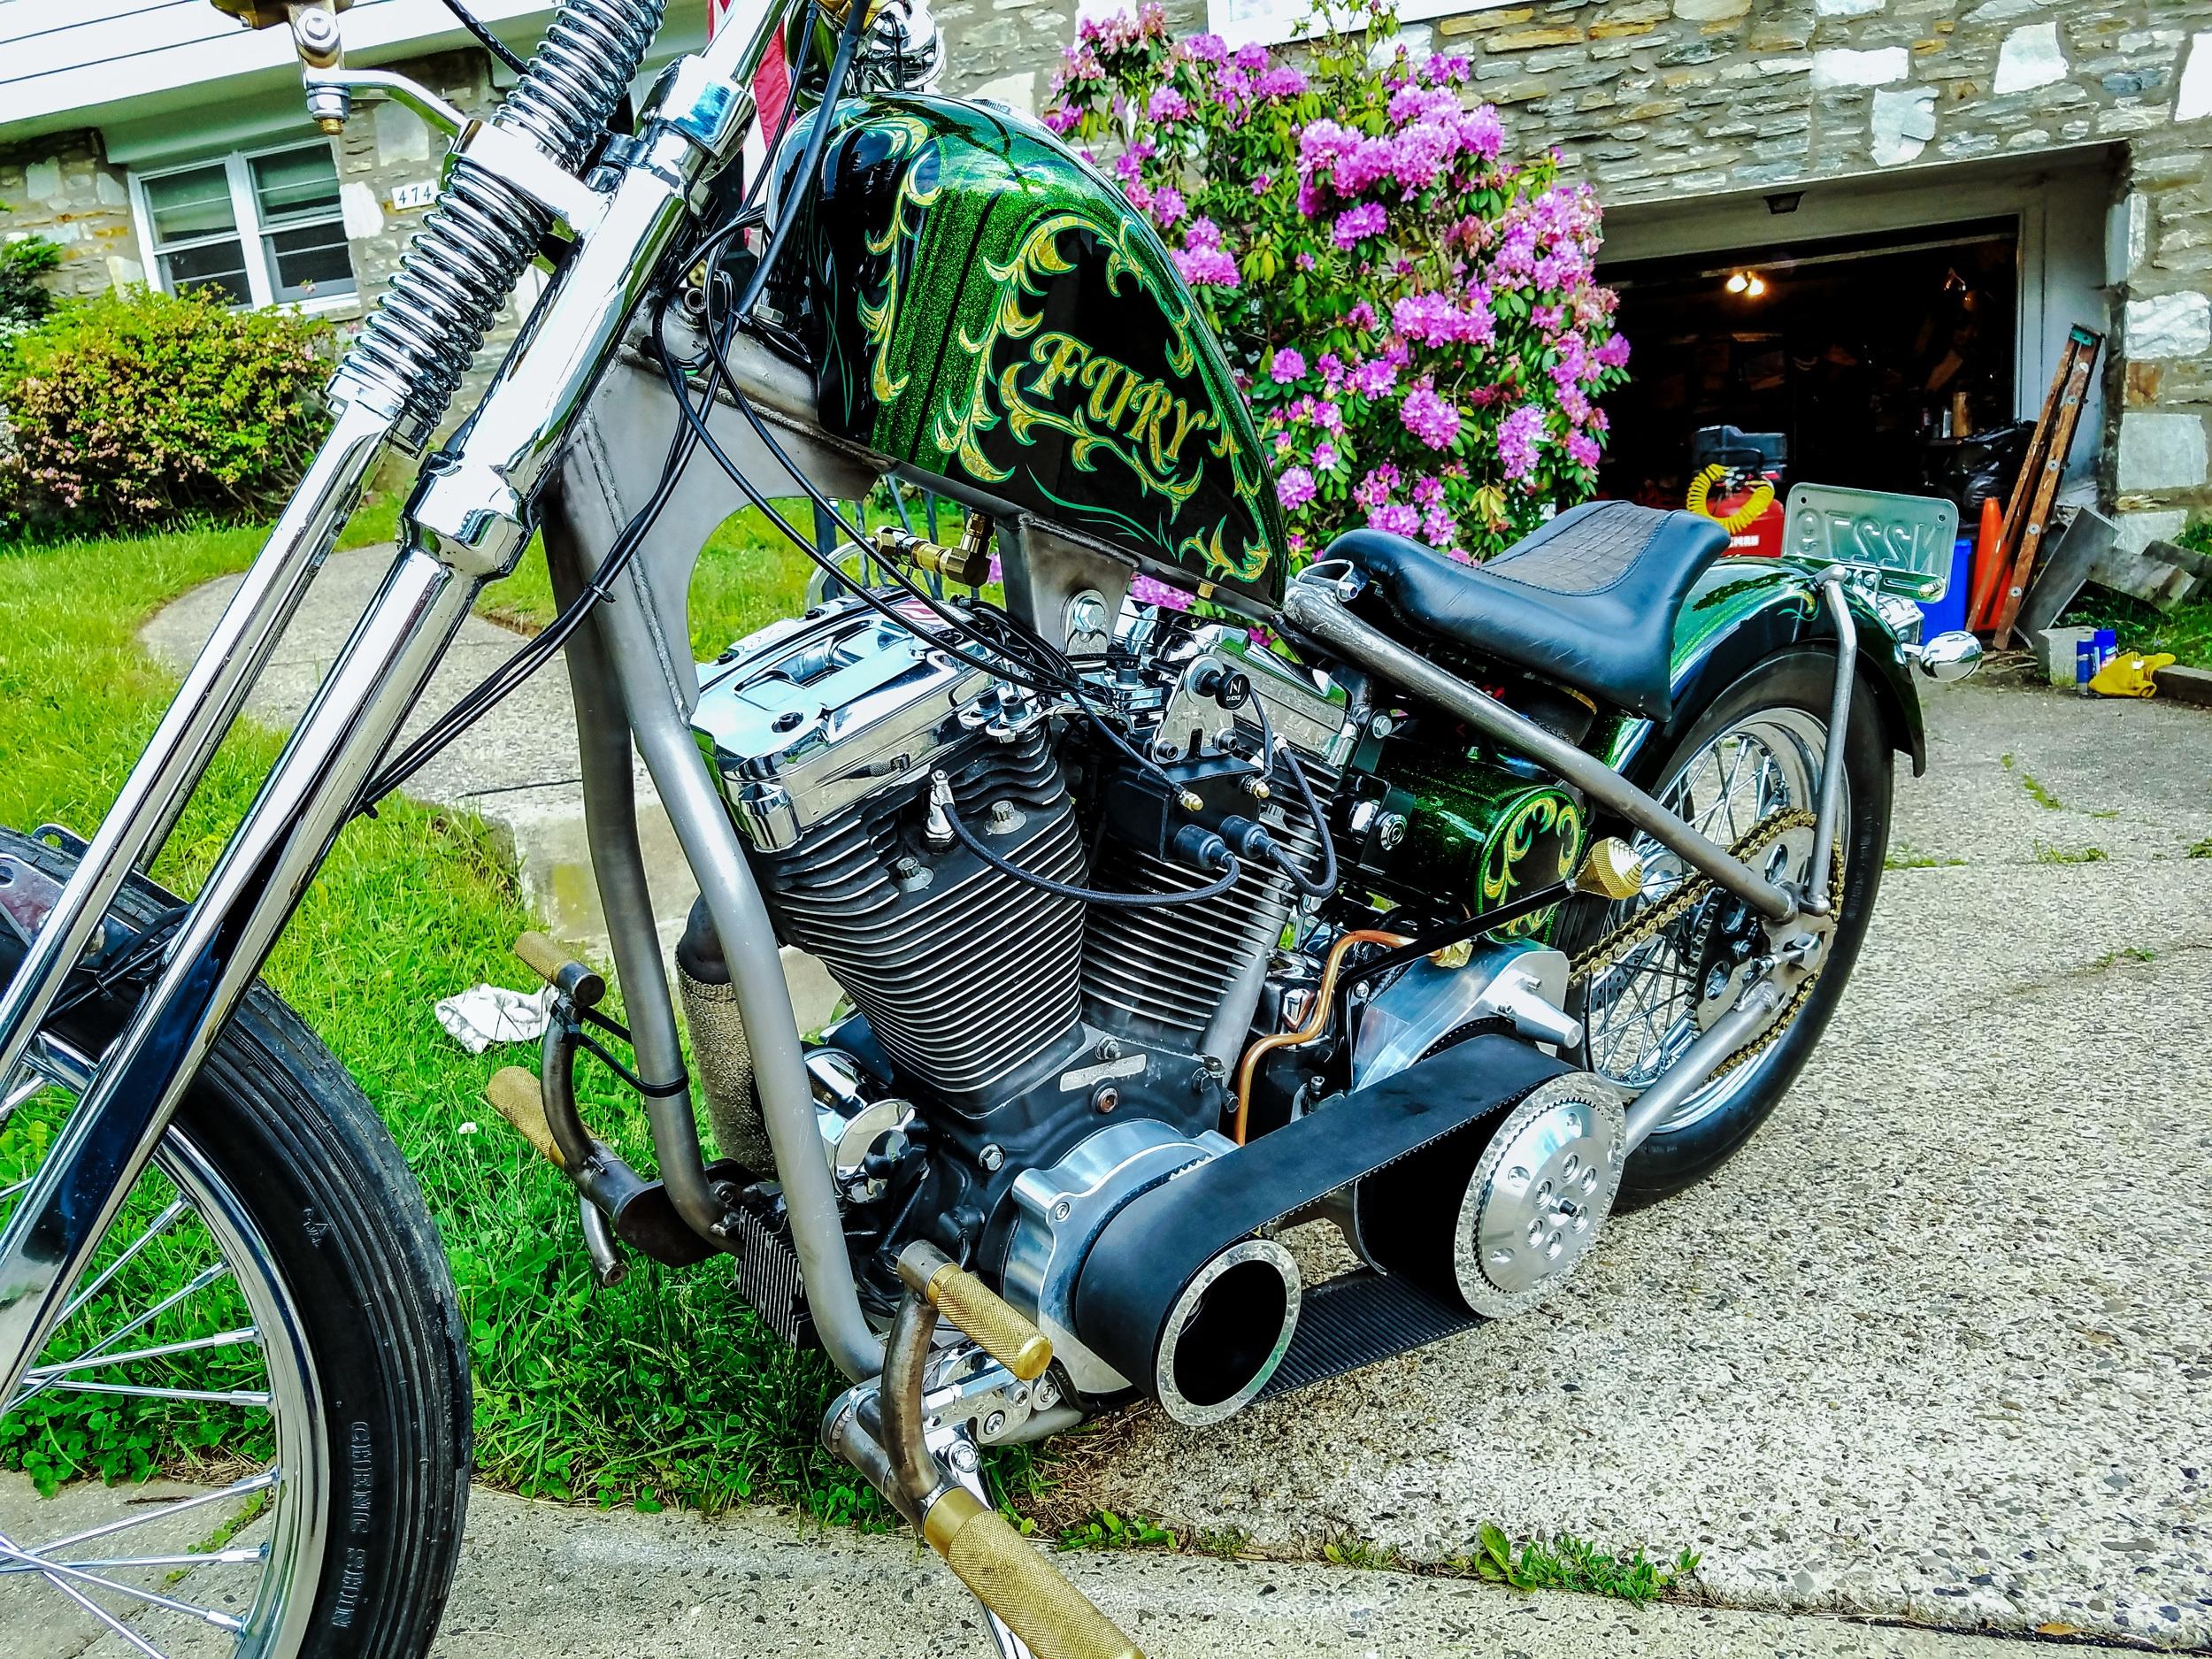 A Customer's bike with our jockey shift knob